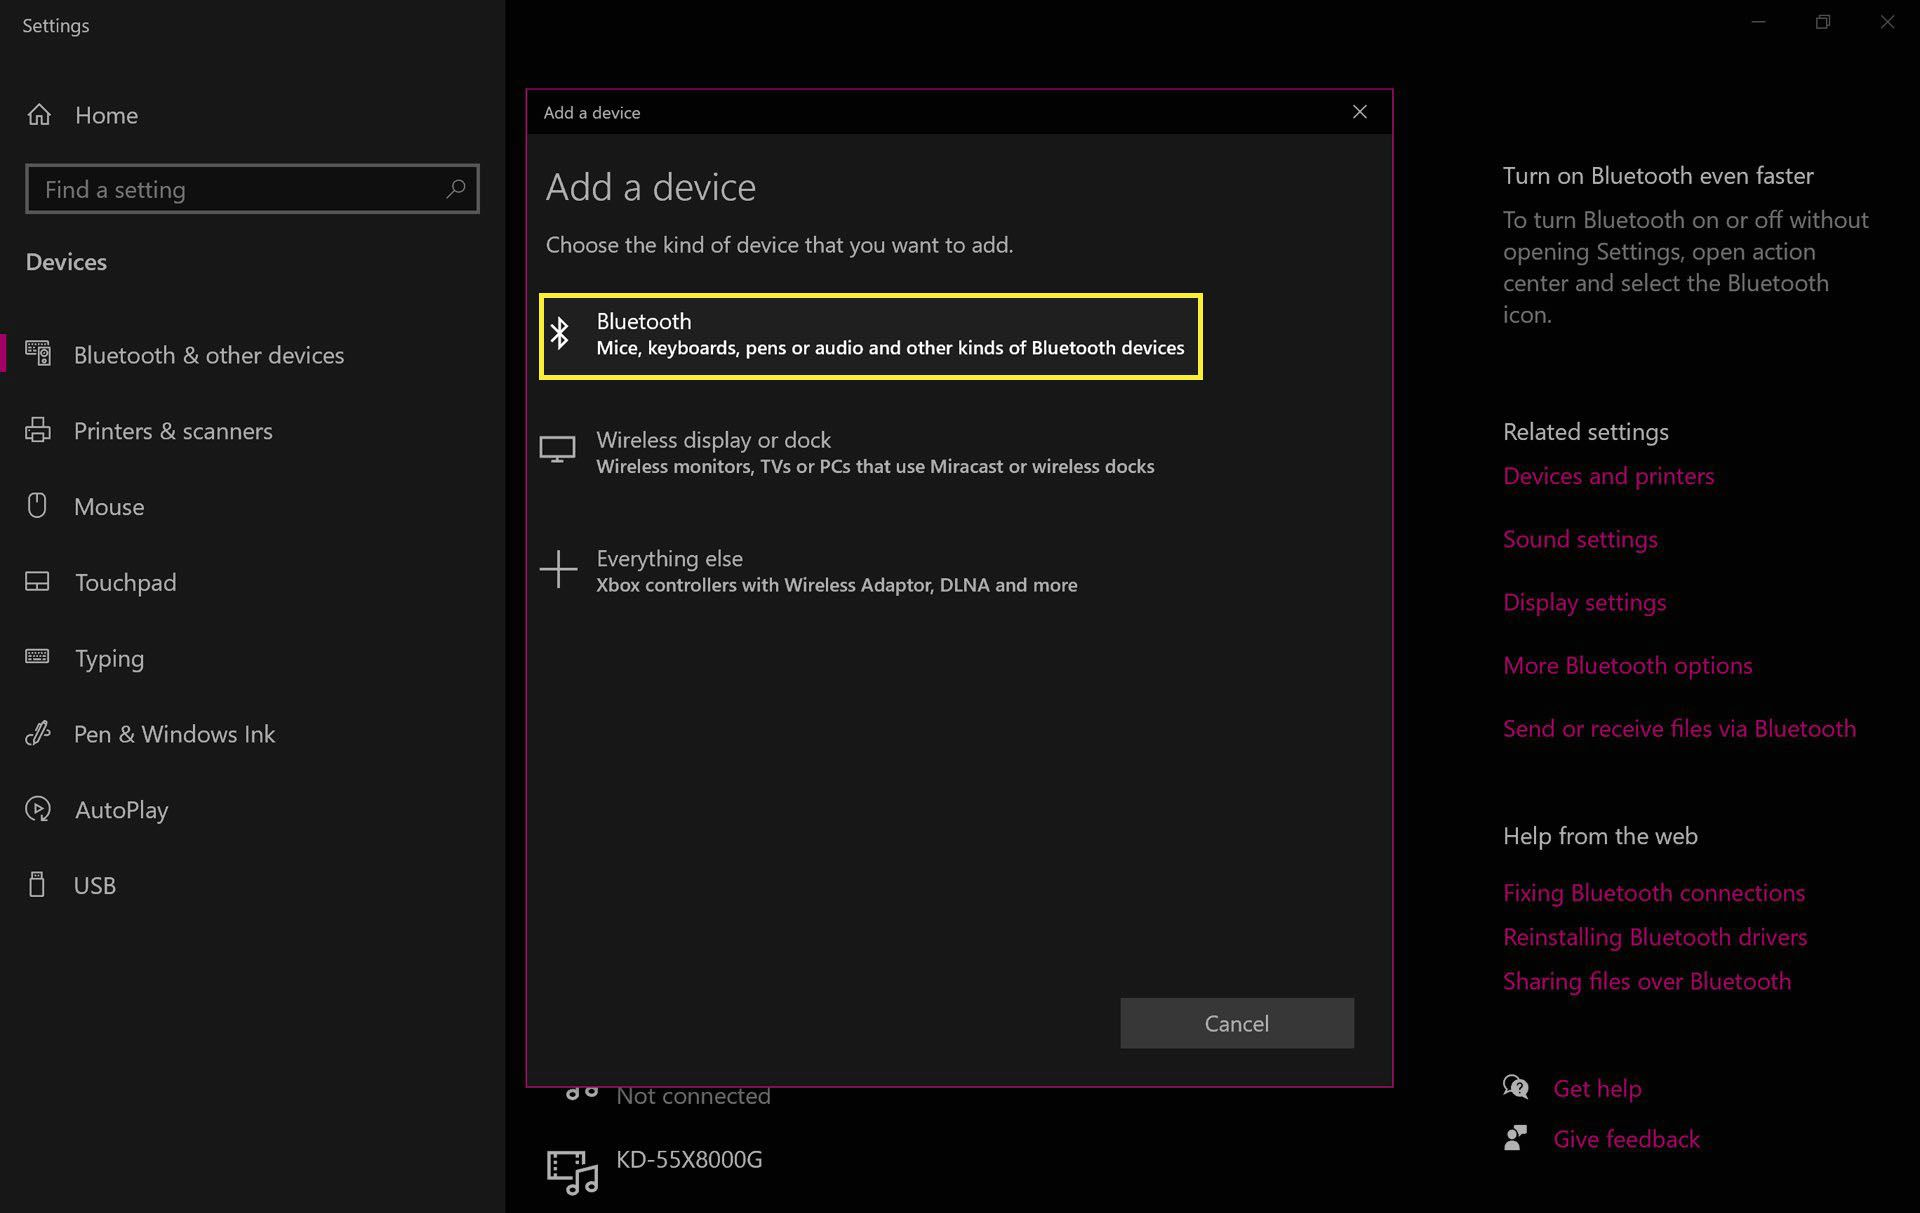 Adding a device to Windows 10.